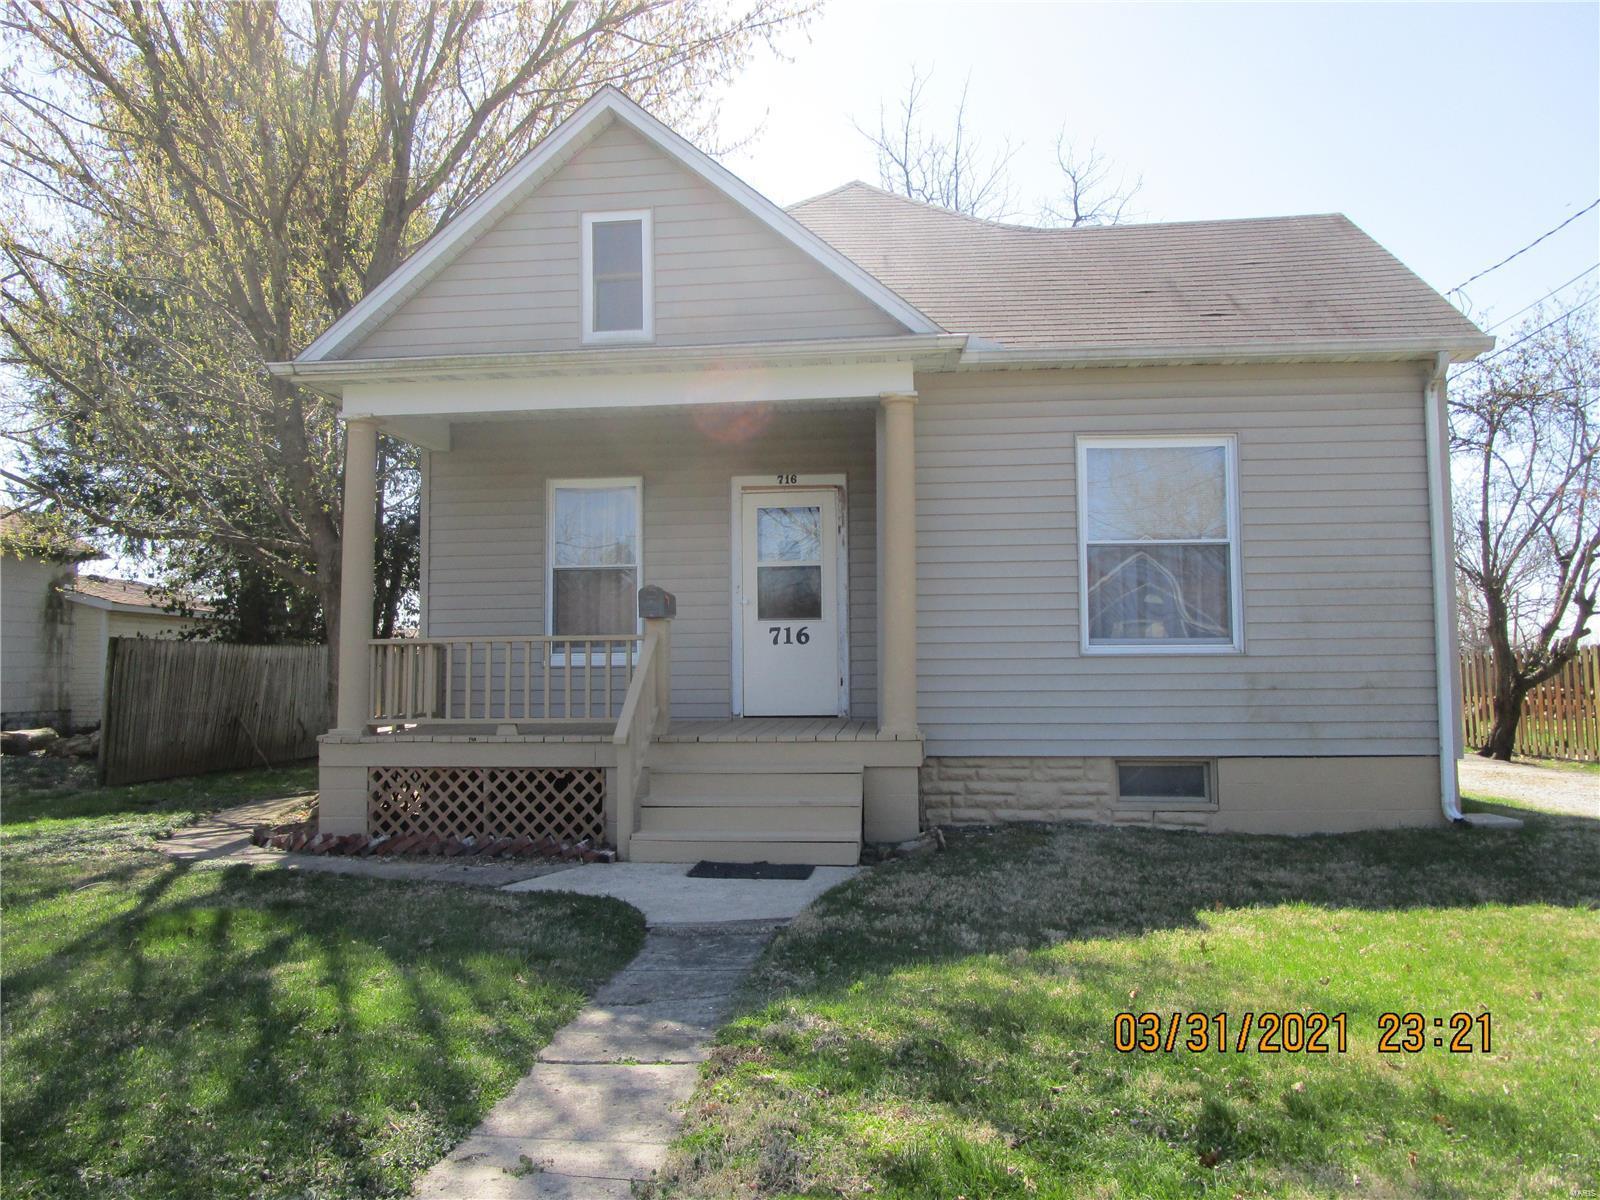 716 W 7th Street Property Photo - Staunton, IL real estate listing